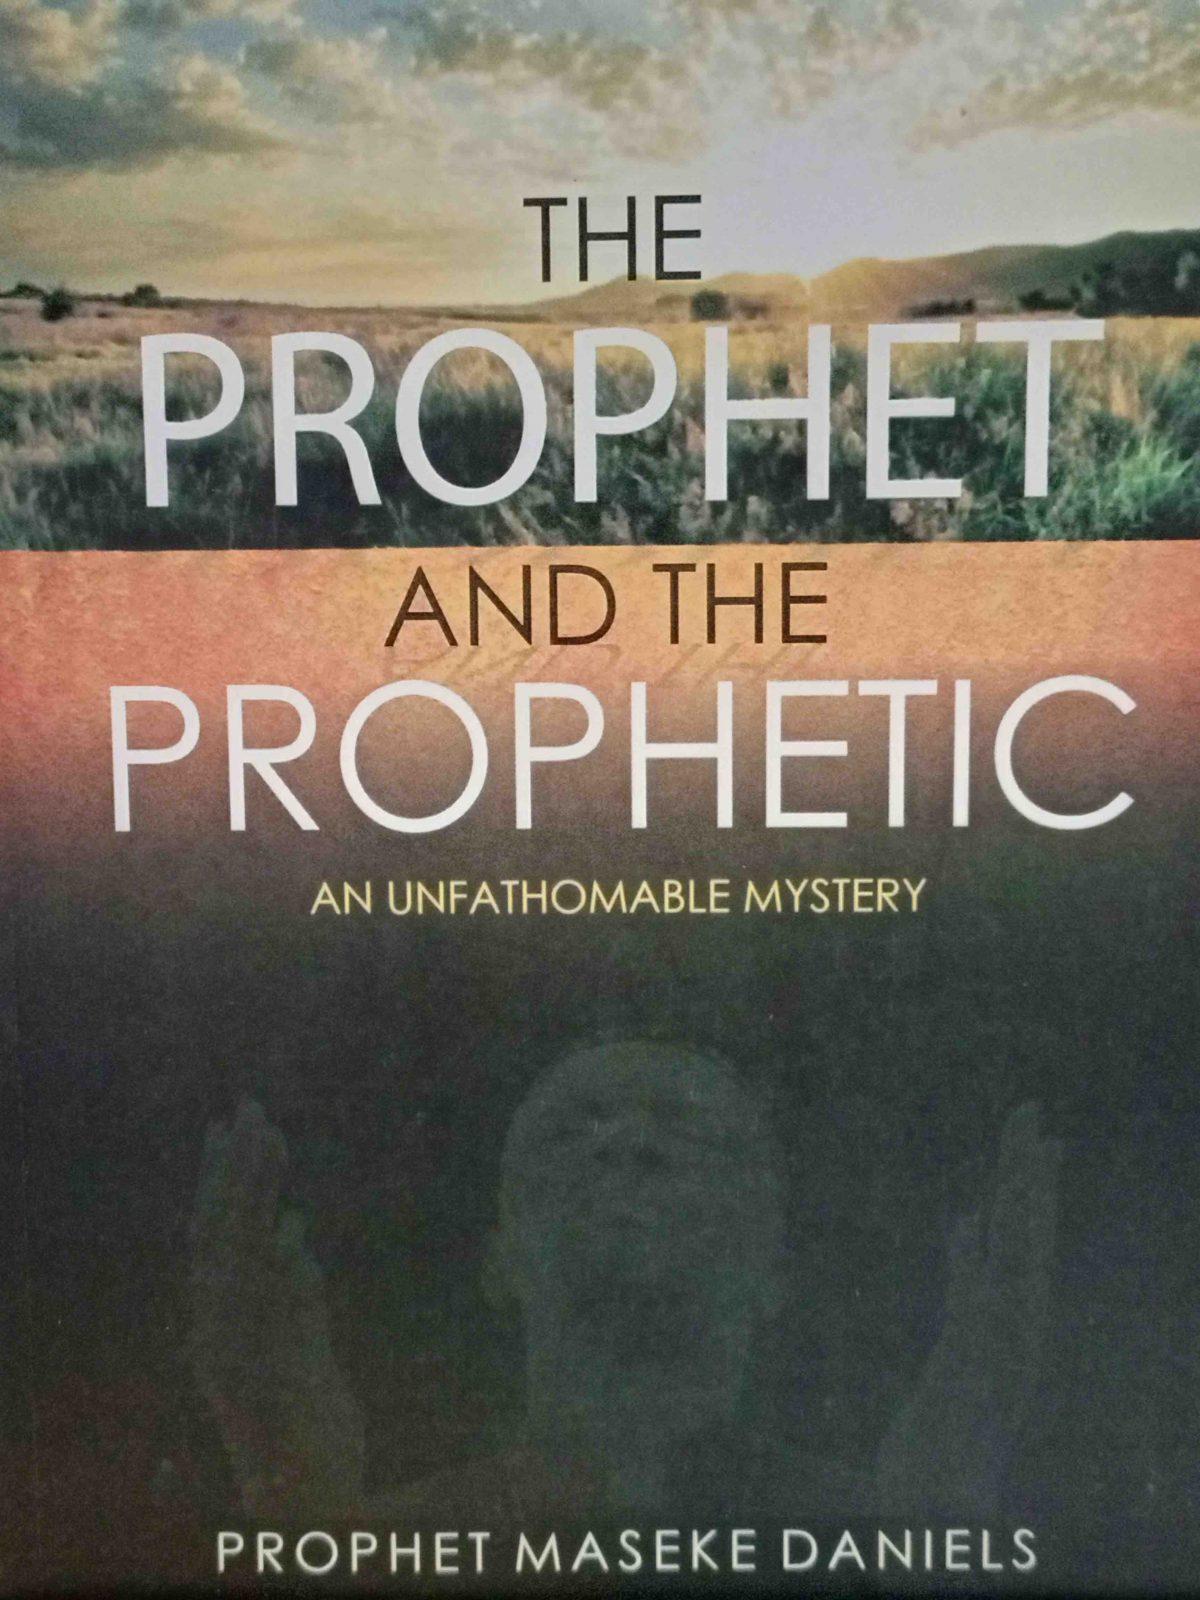 The Prophet and the Prophetic By Prophet Maseke Daniels